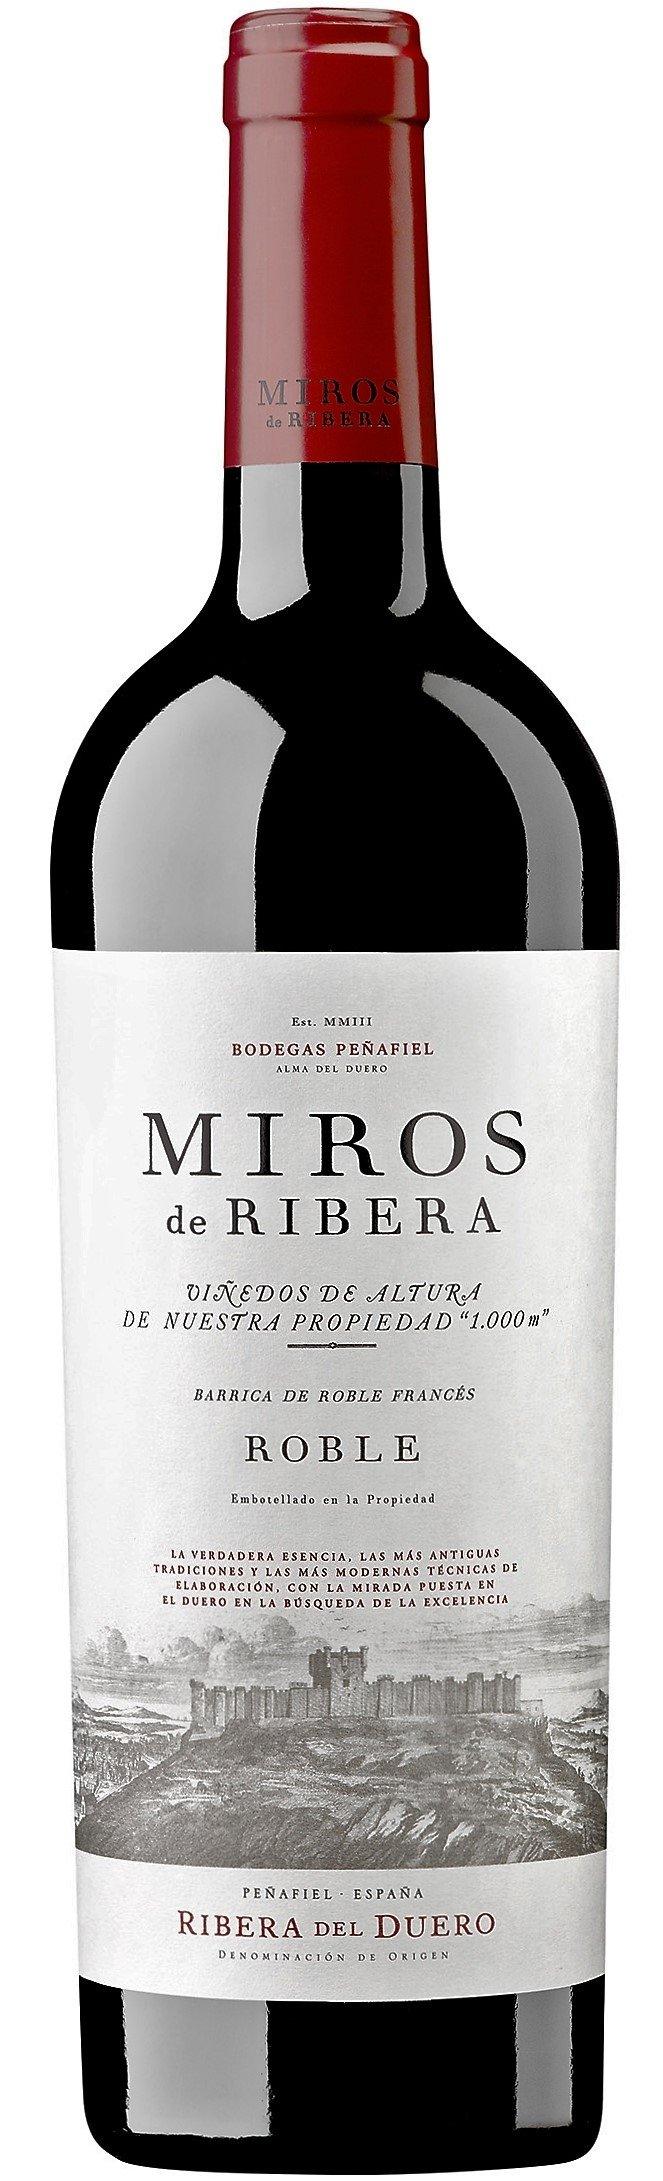 Bodegas Penafiel 'Miros de Ribera' Roble 2015 [Tempranillo-Merlot-Cabernet]-0